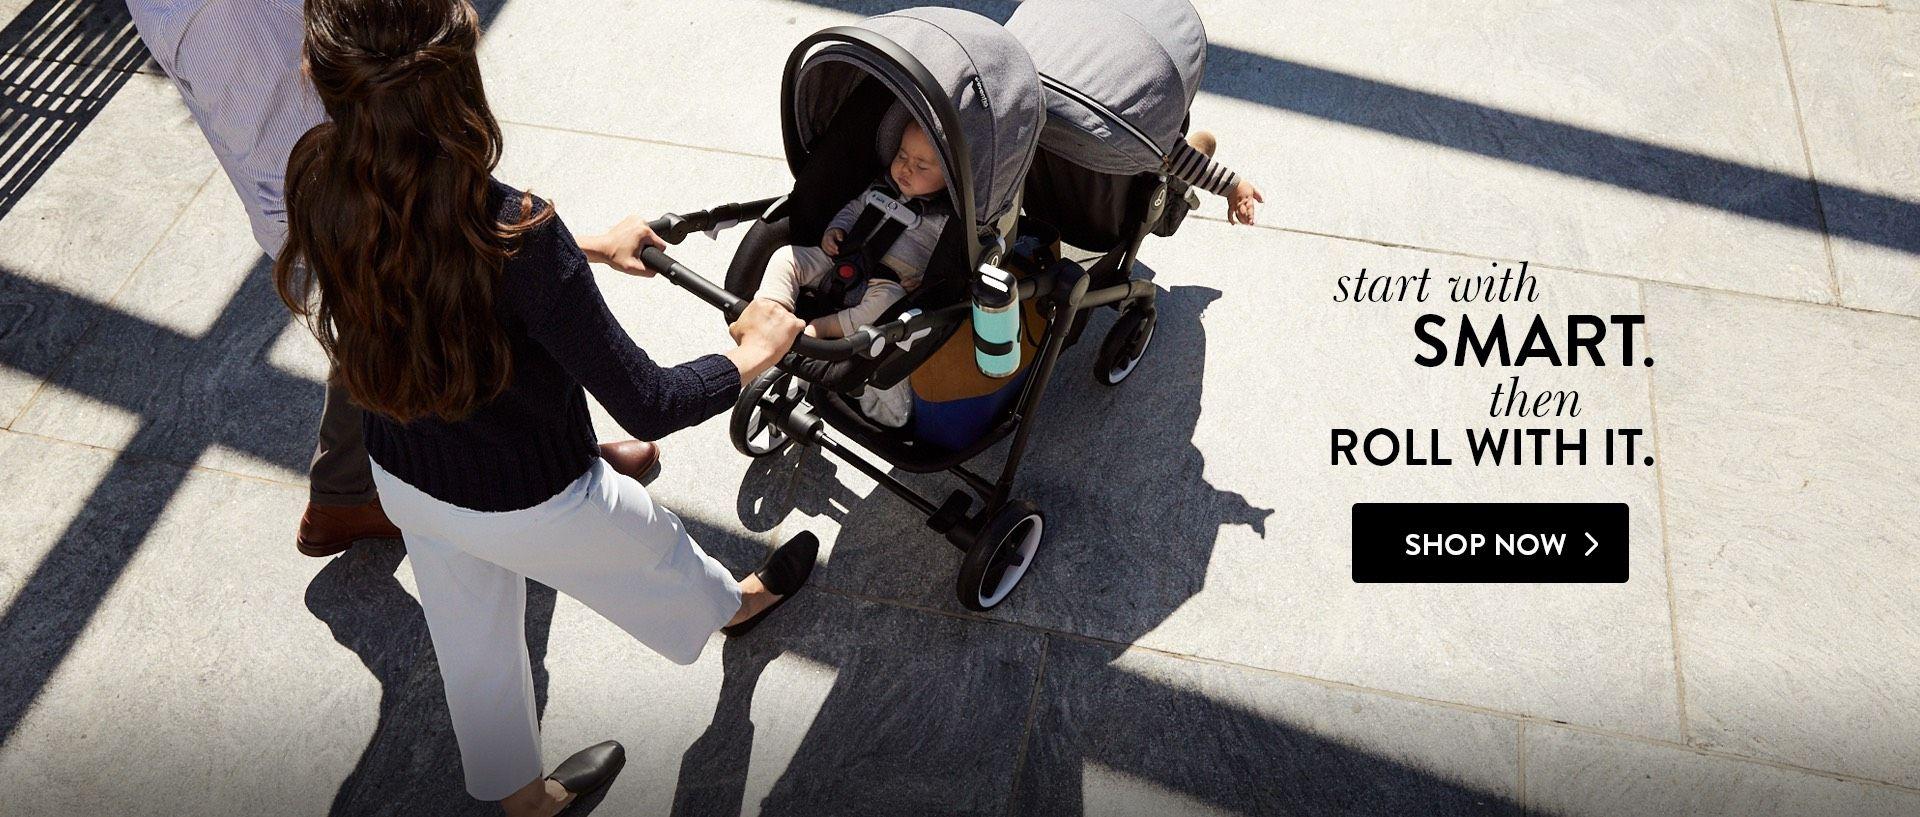 Evenflo Gold Car seats, Travel system, Modular stroller